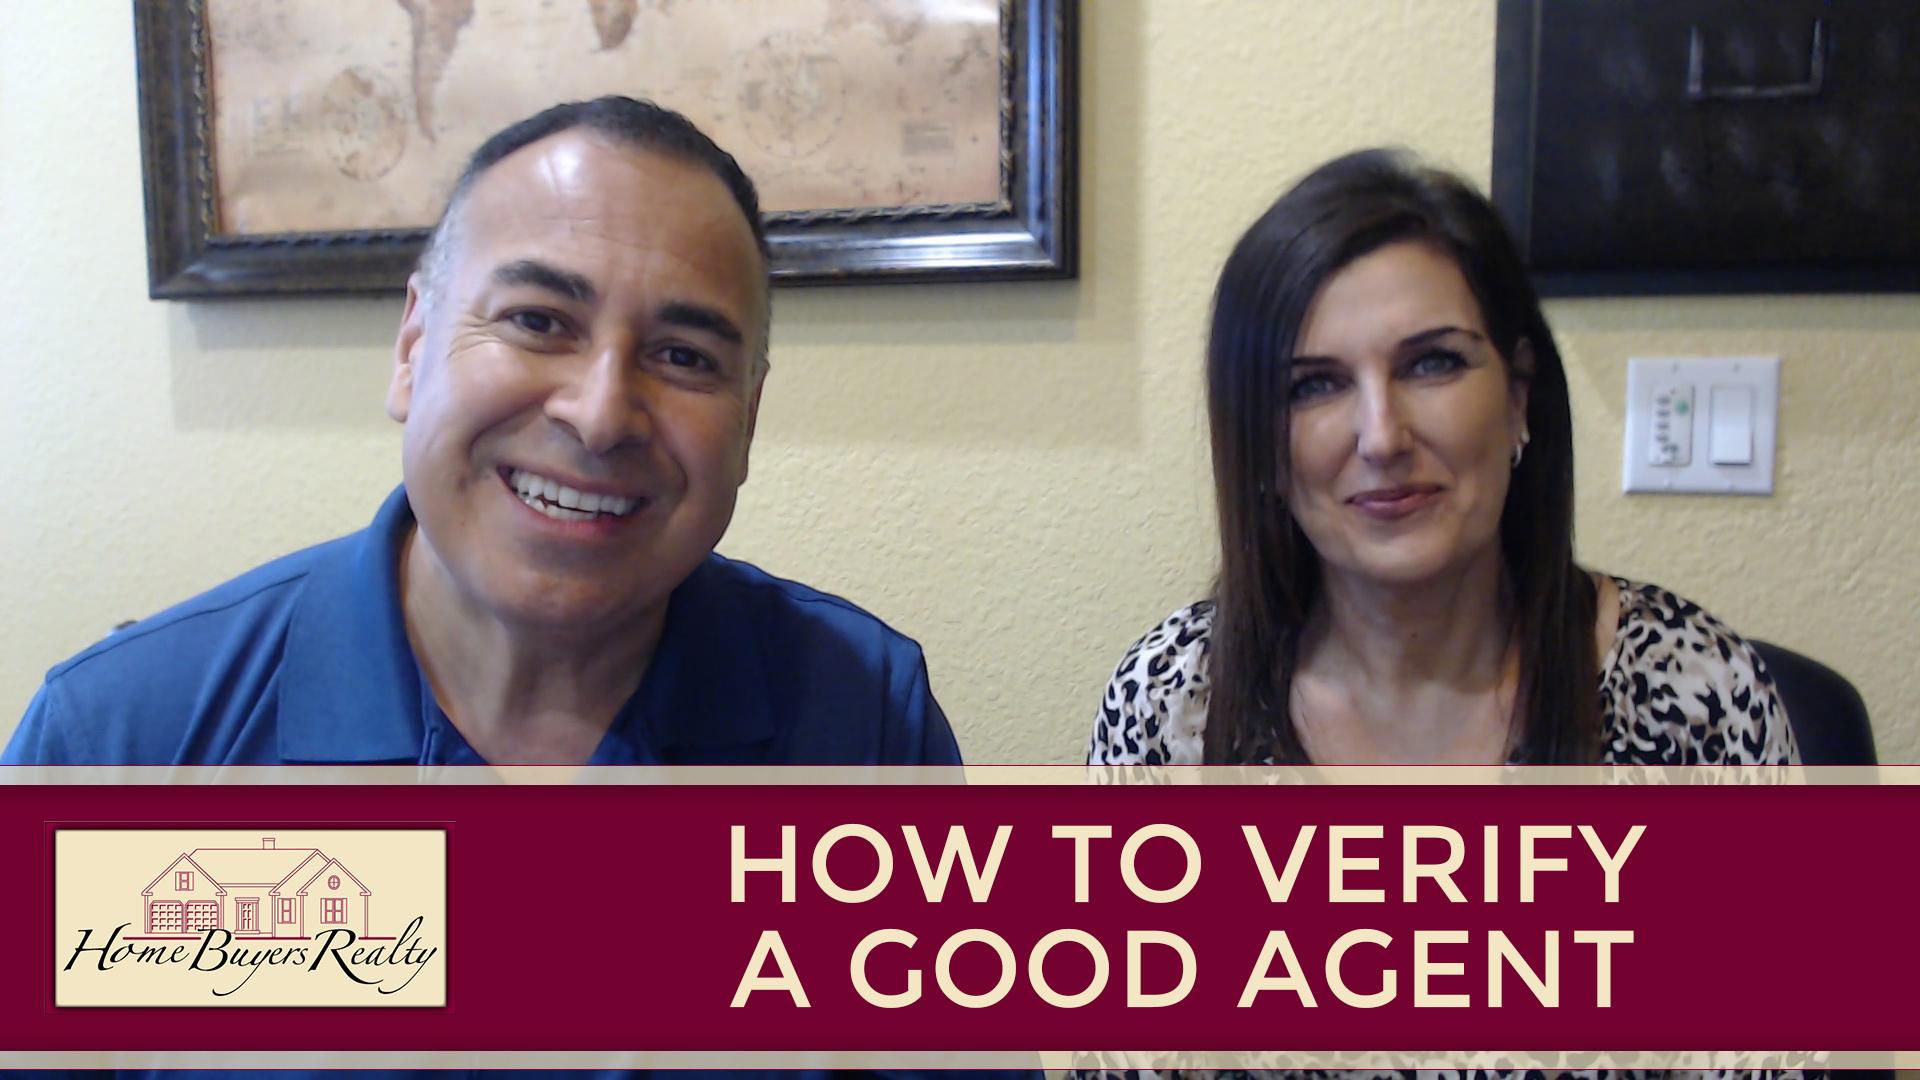 Verifying a Good Agent